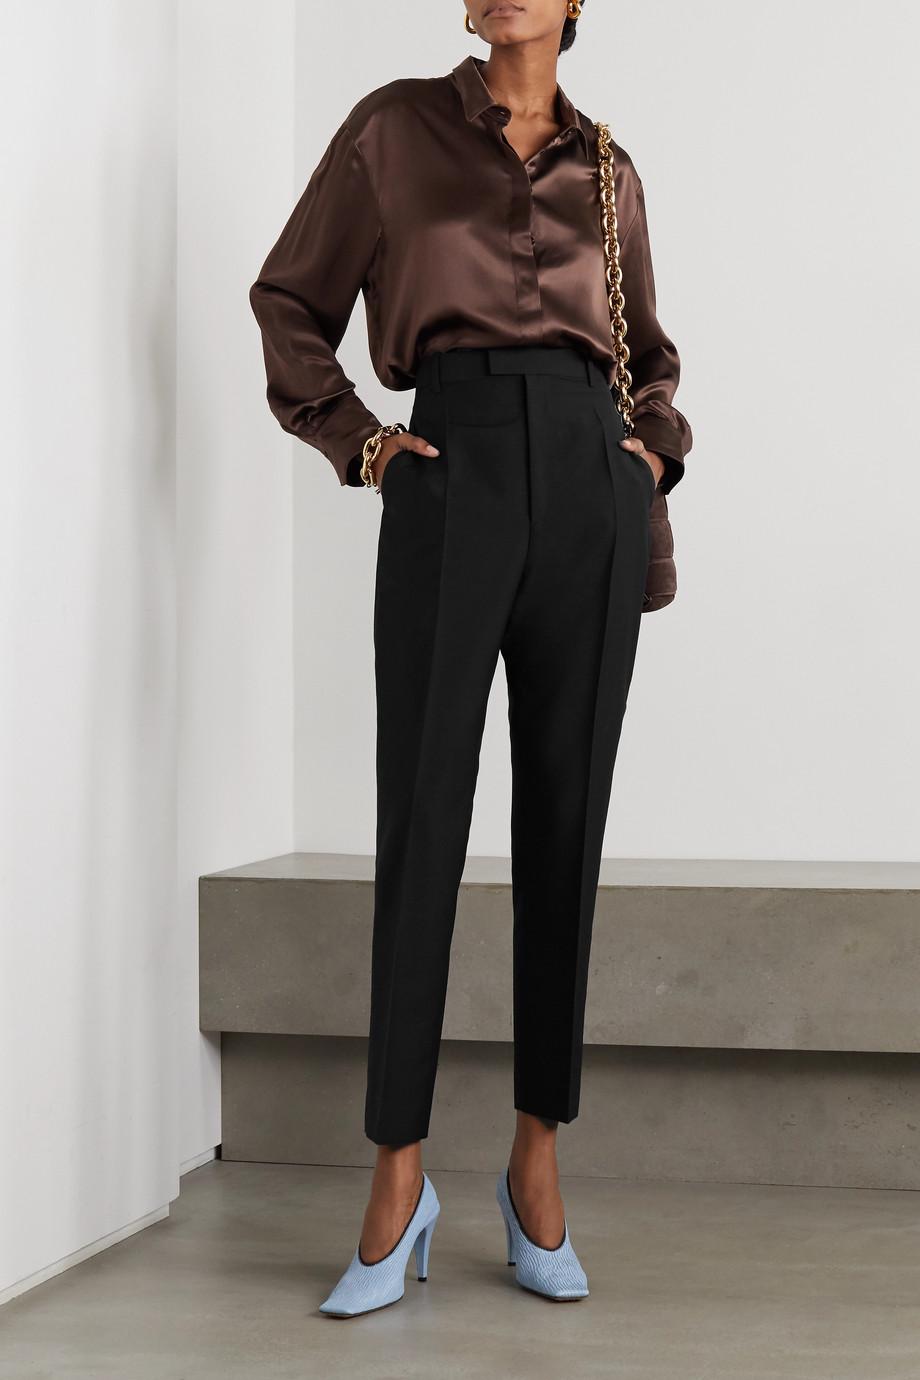 Bottega Veneta 马海毛羊毛混纺直筒裤